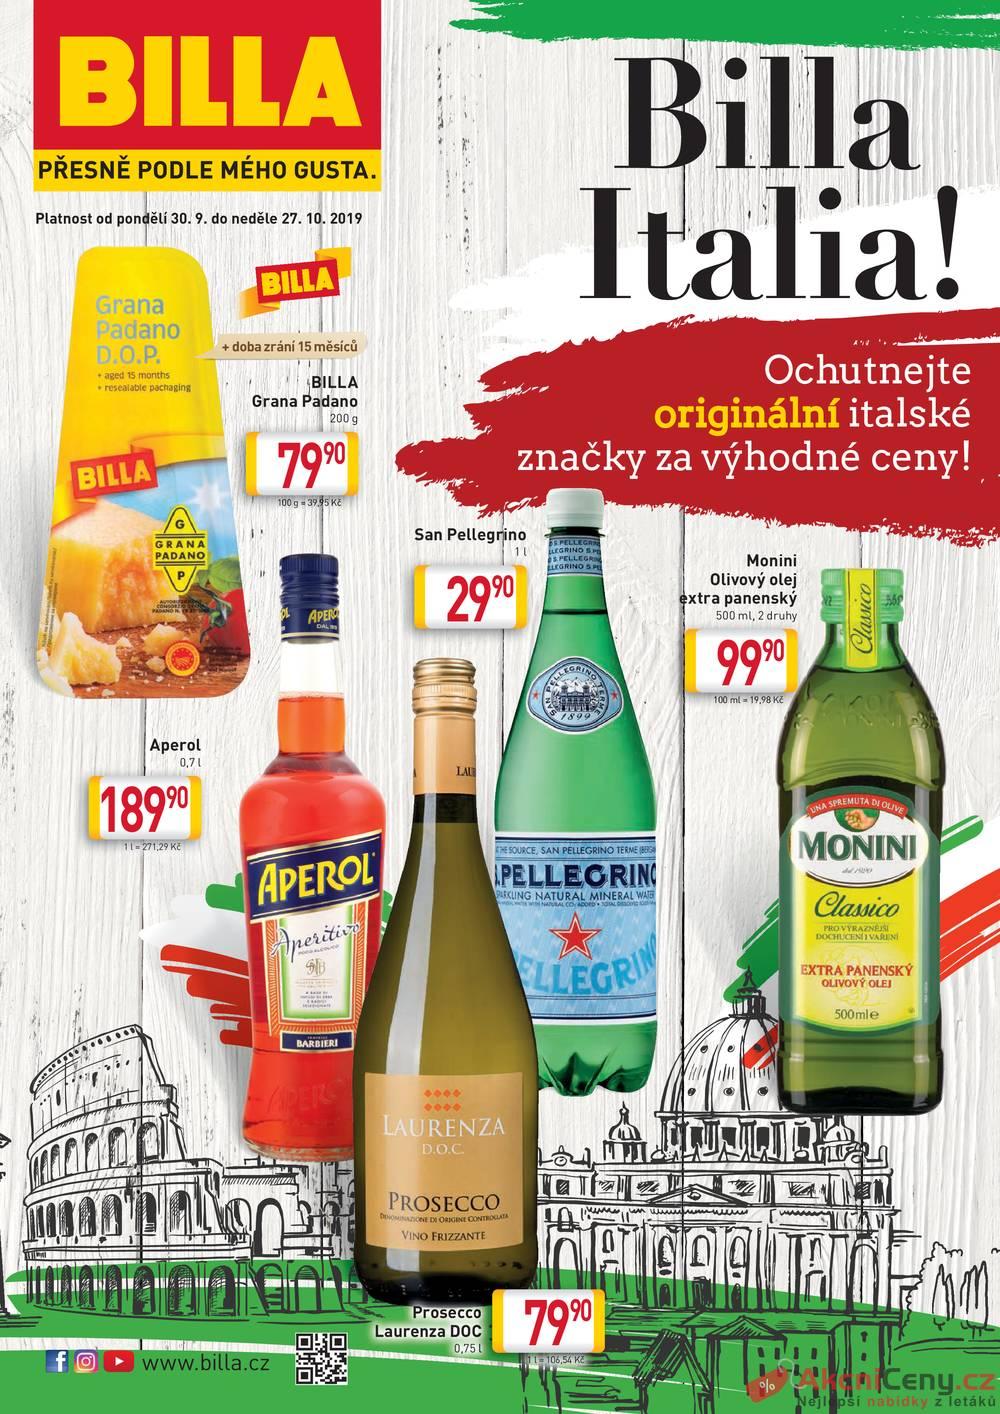 Leták Billa - Billa katalog Itálie od 30.9. do 27.10.2019 - strana 1